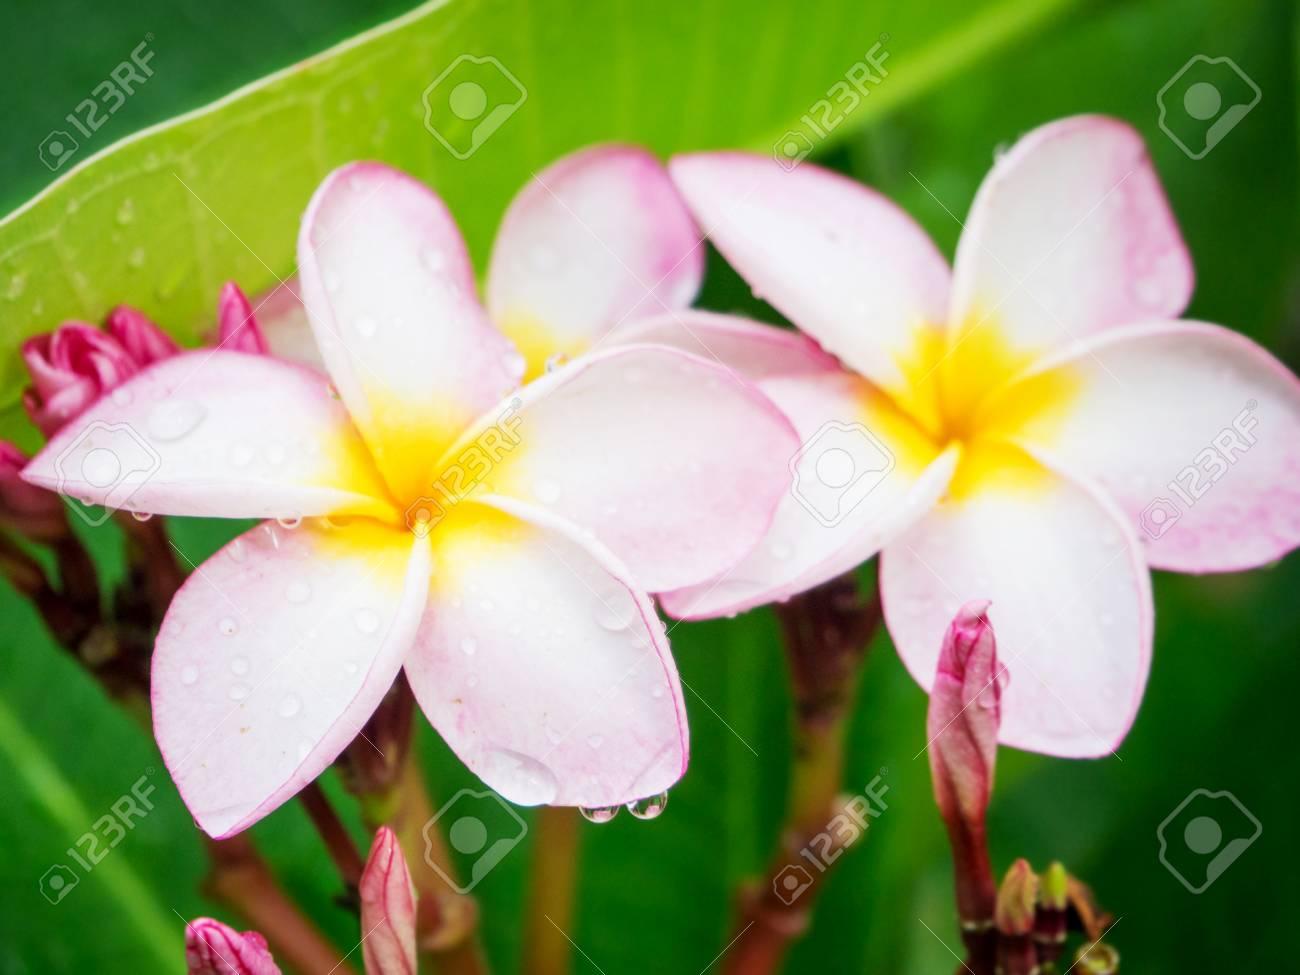 Pink plumeria flower with rain drop on tree stock photo picture and pink plumeria flower with rain drop on tree stock photo 57270375 mightylinksfo